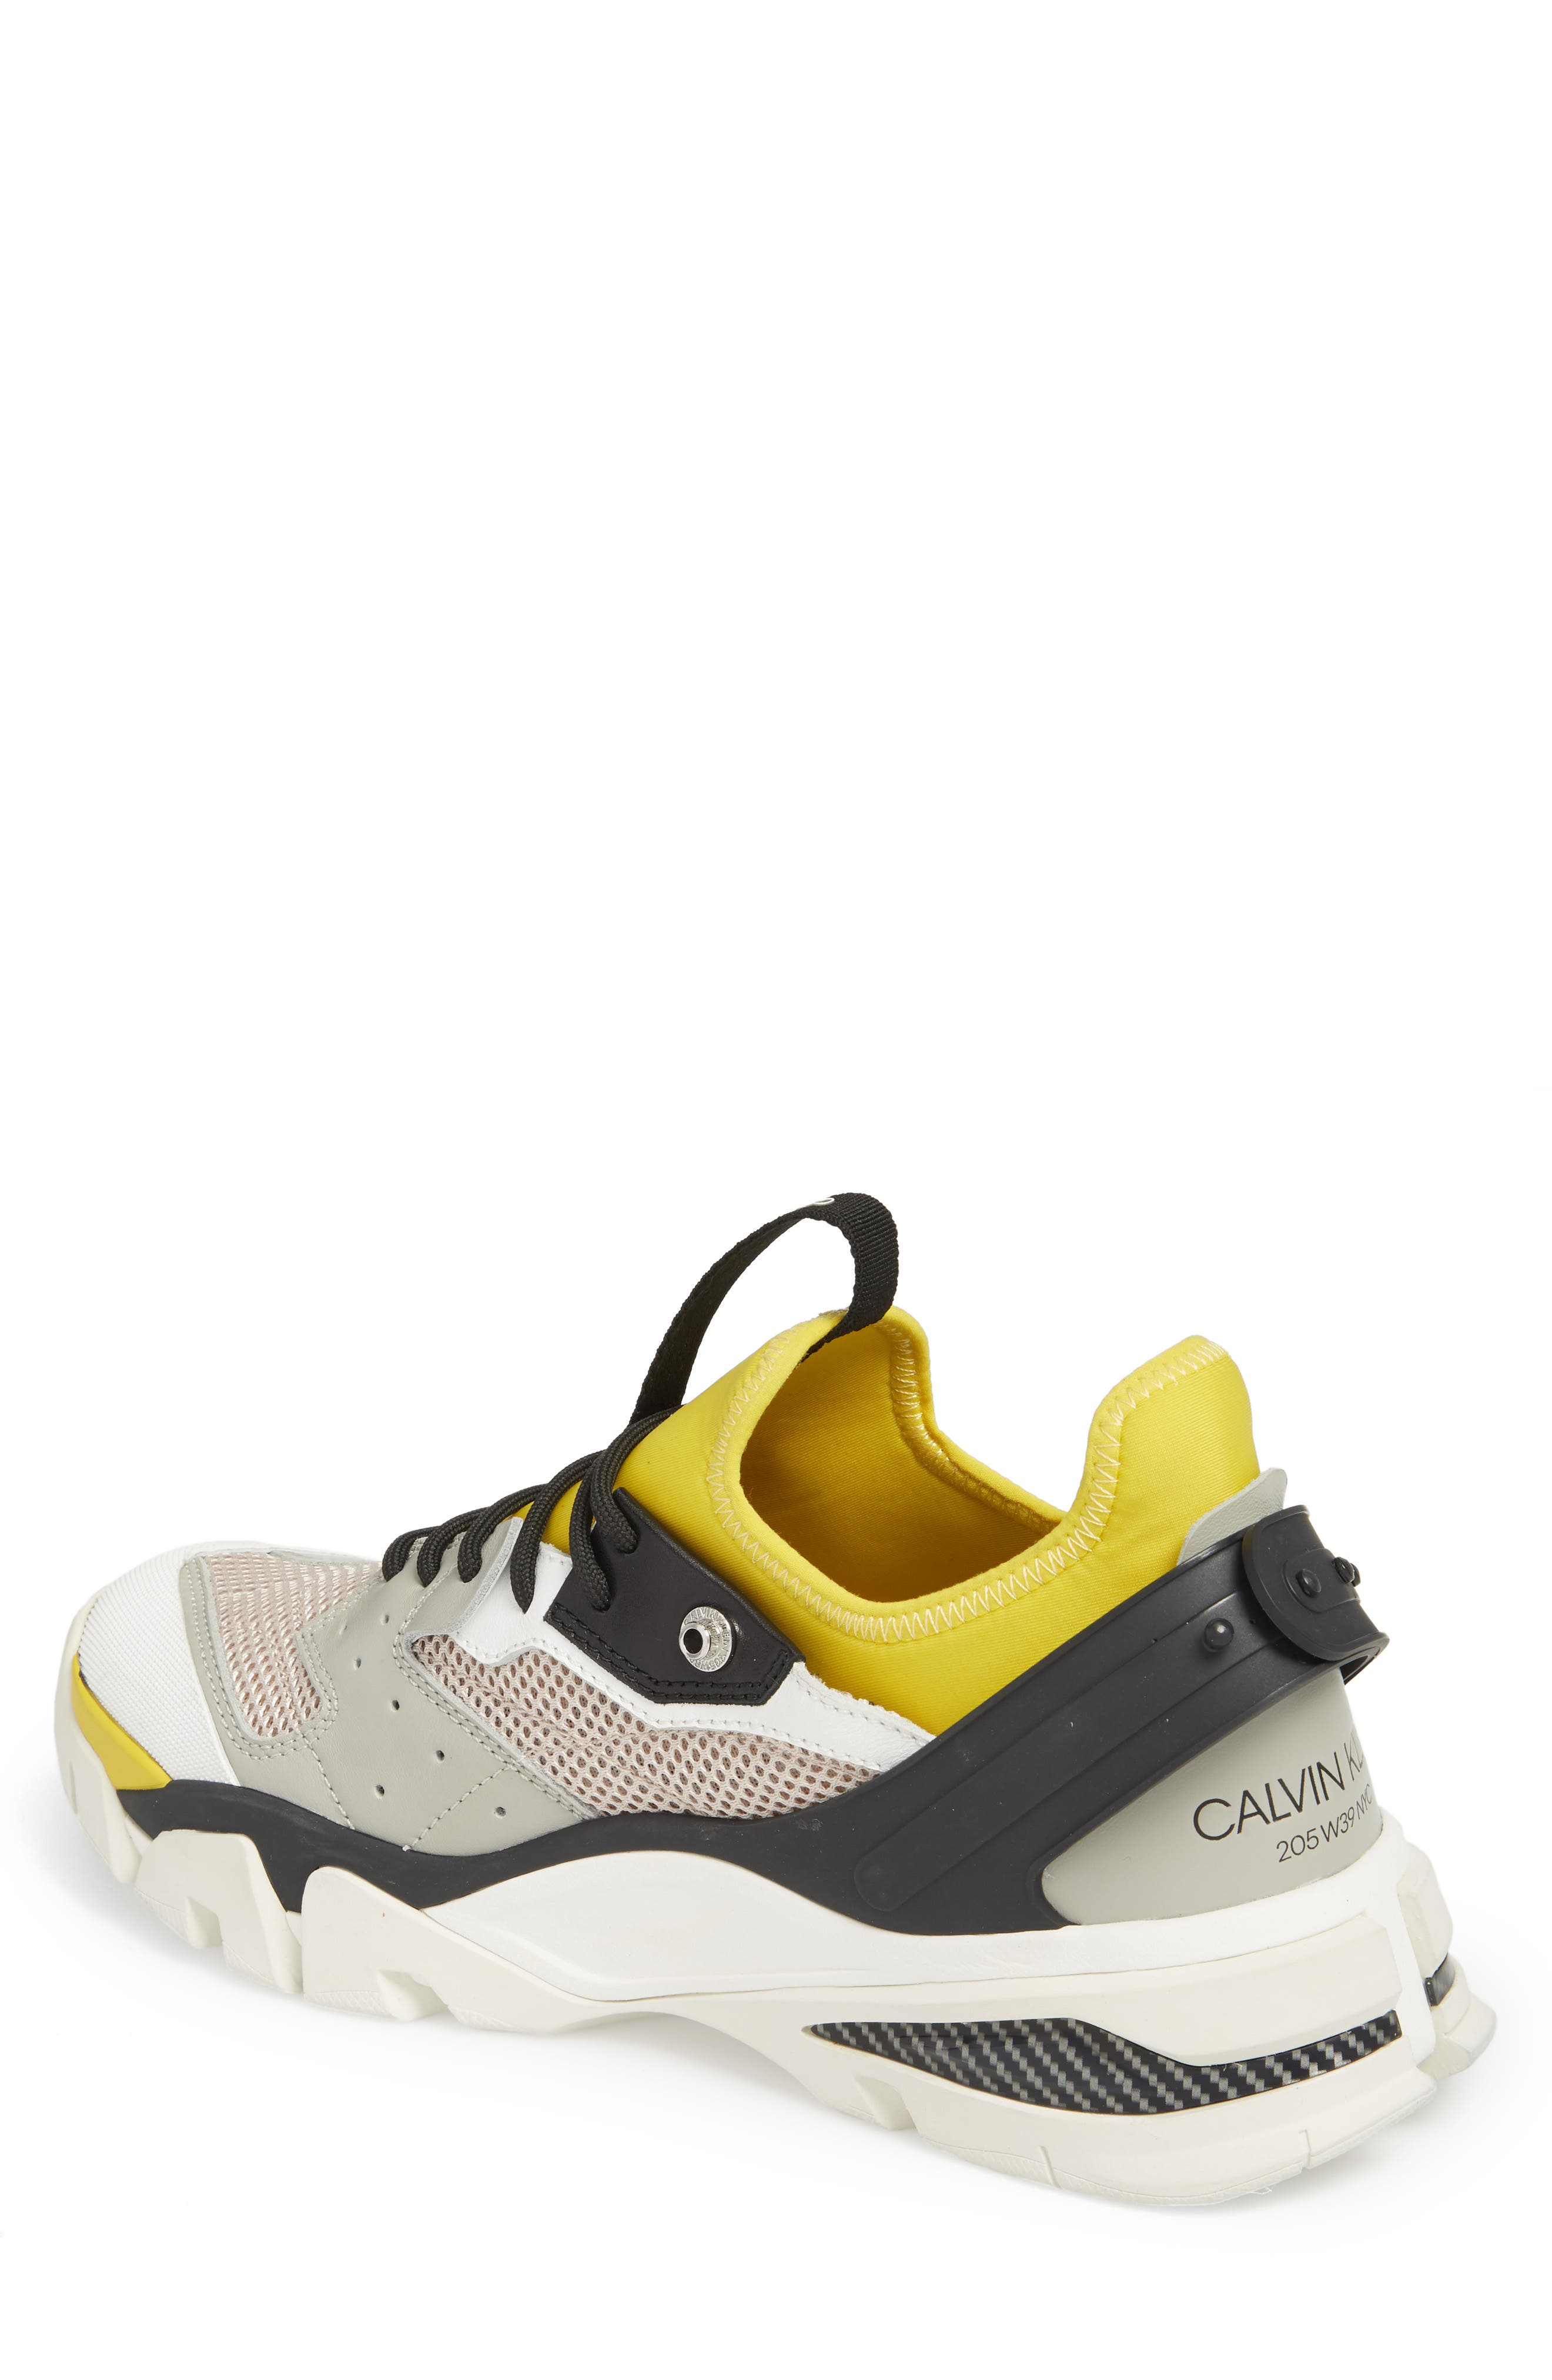 Carlos 10 Snapback Runner Sneaker,                             Alternate thumbnail 2, color,                             GREY/ YELLOW/ BLACK/ WHITE